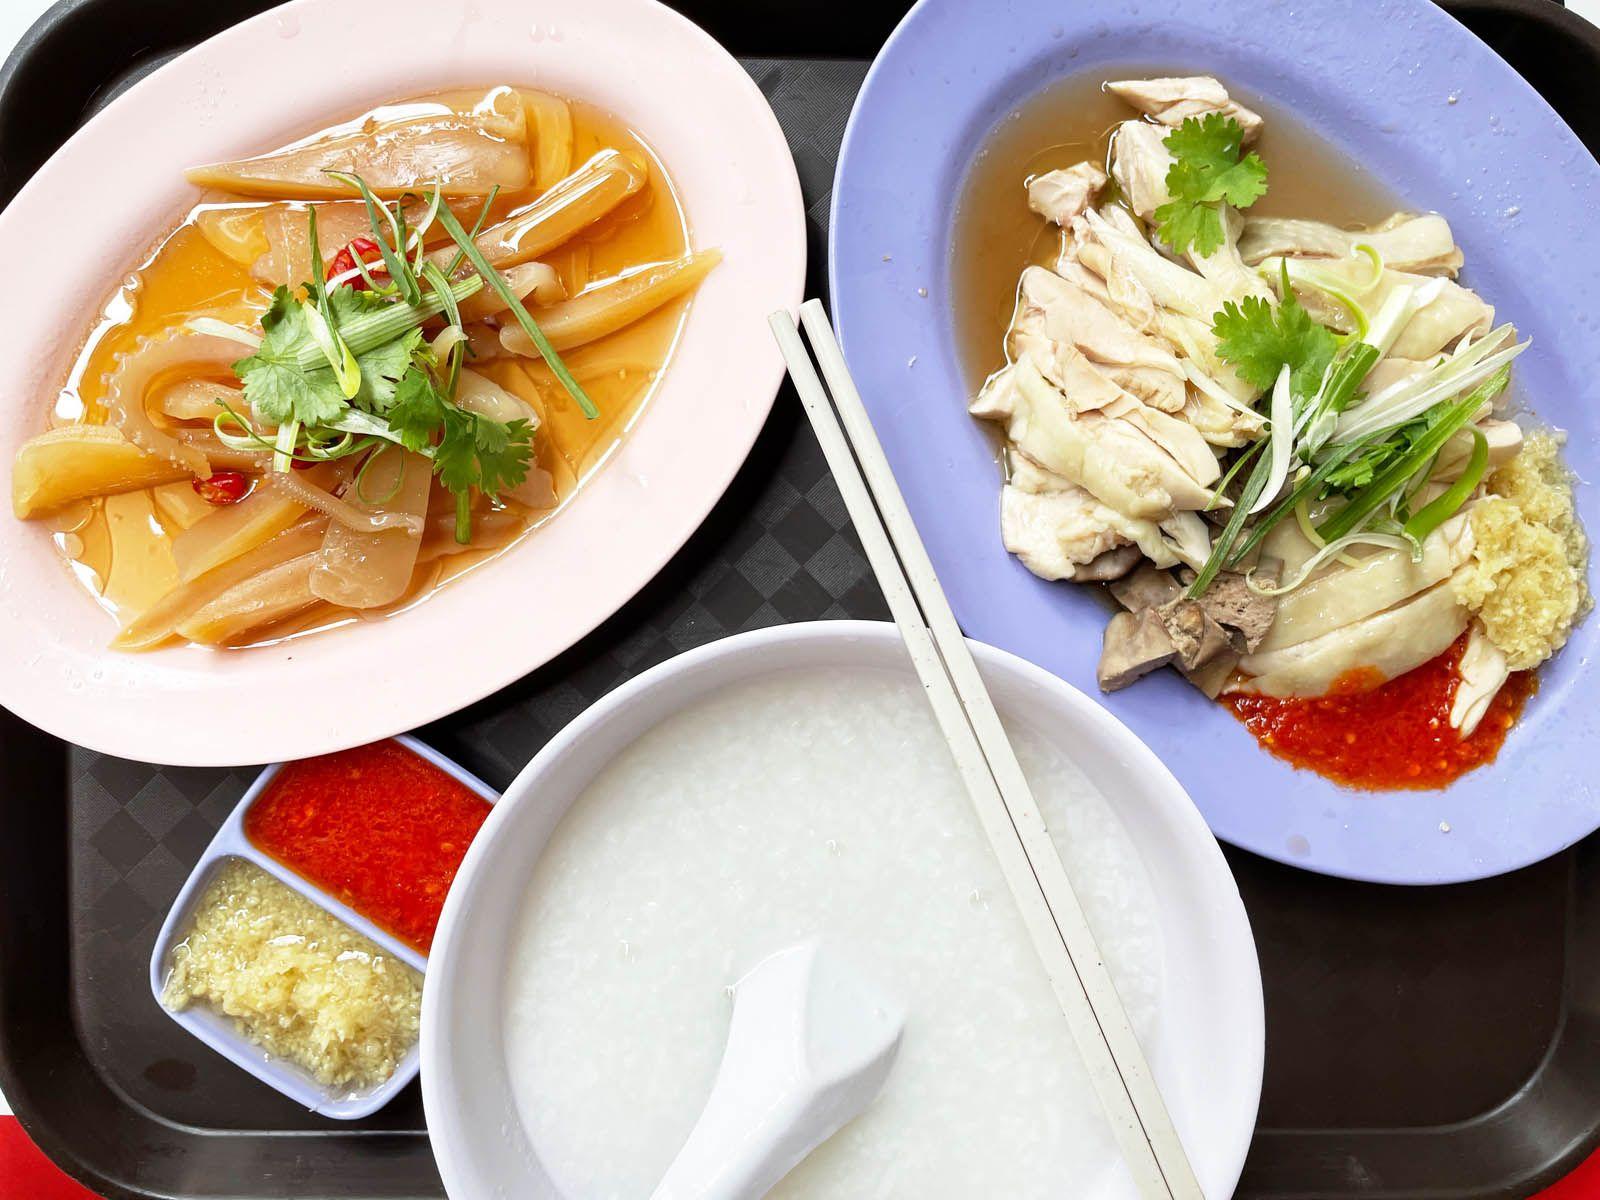 Fook Seng Goldenhill Chicken Rice (Photo: Petrina Loh)